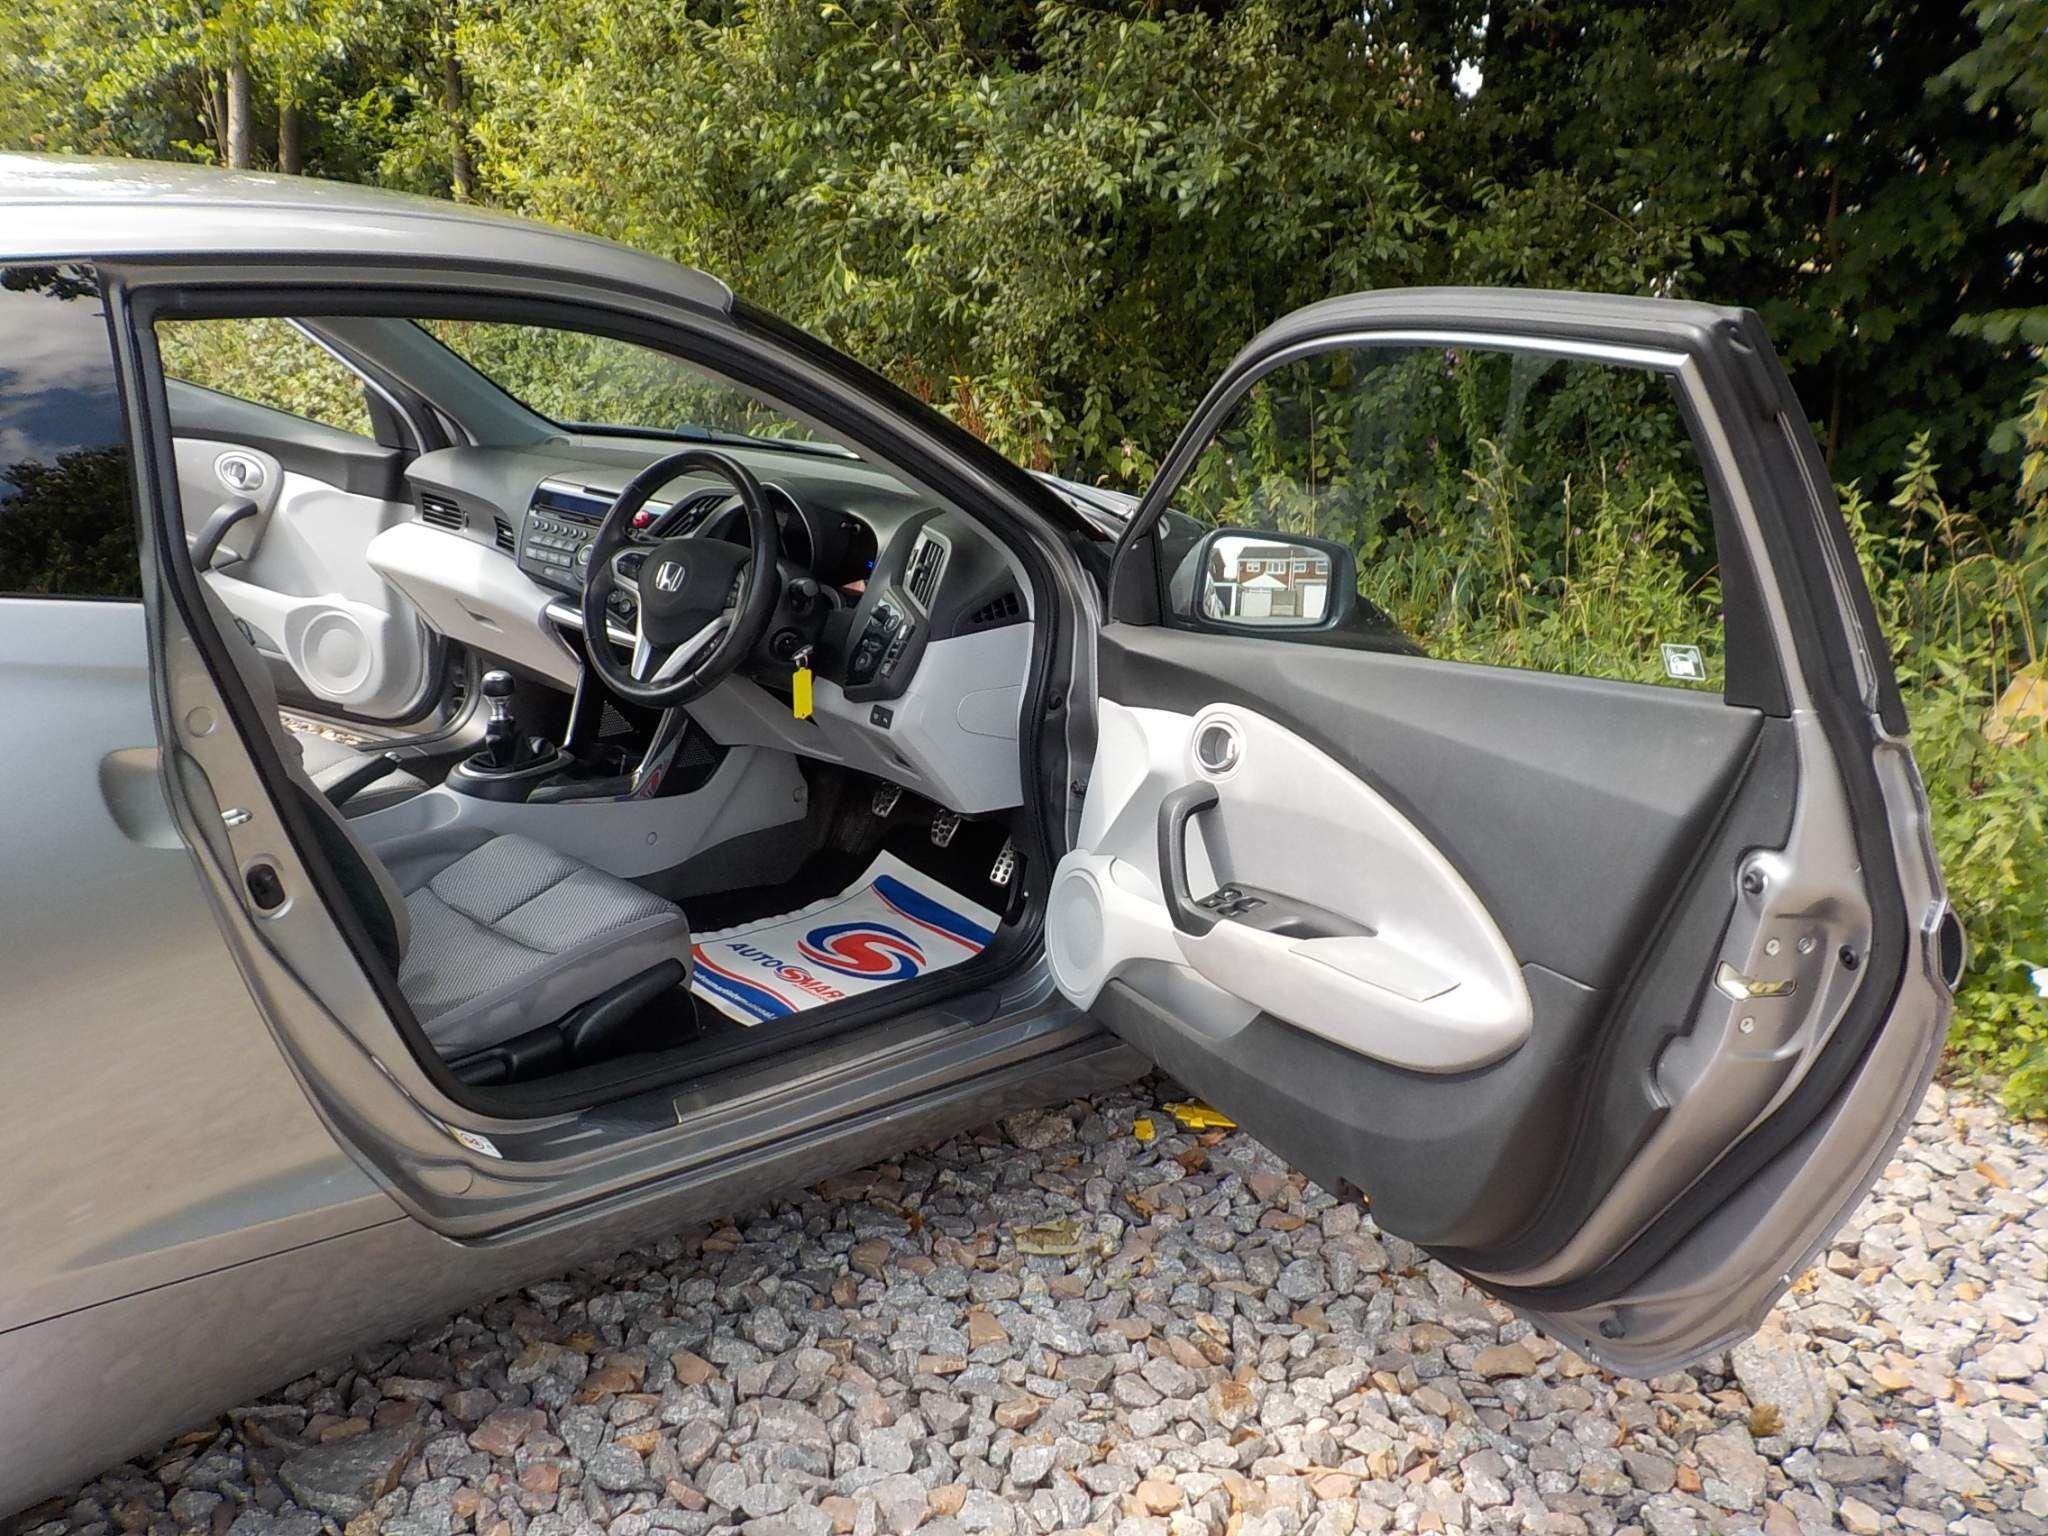 Honda CR-Z 1.5 IMA Sport 3dr